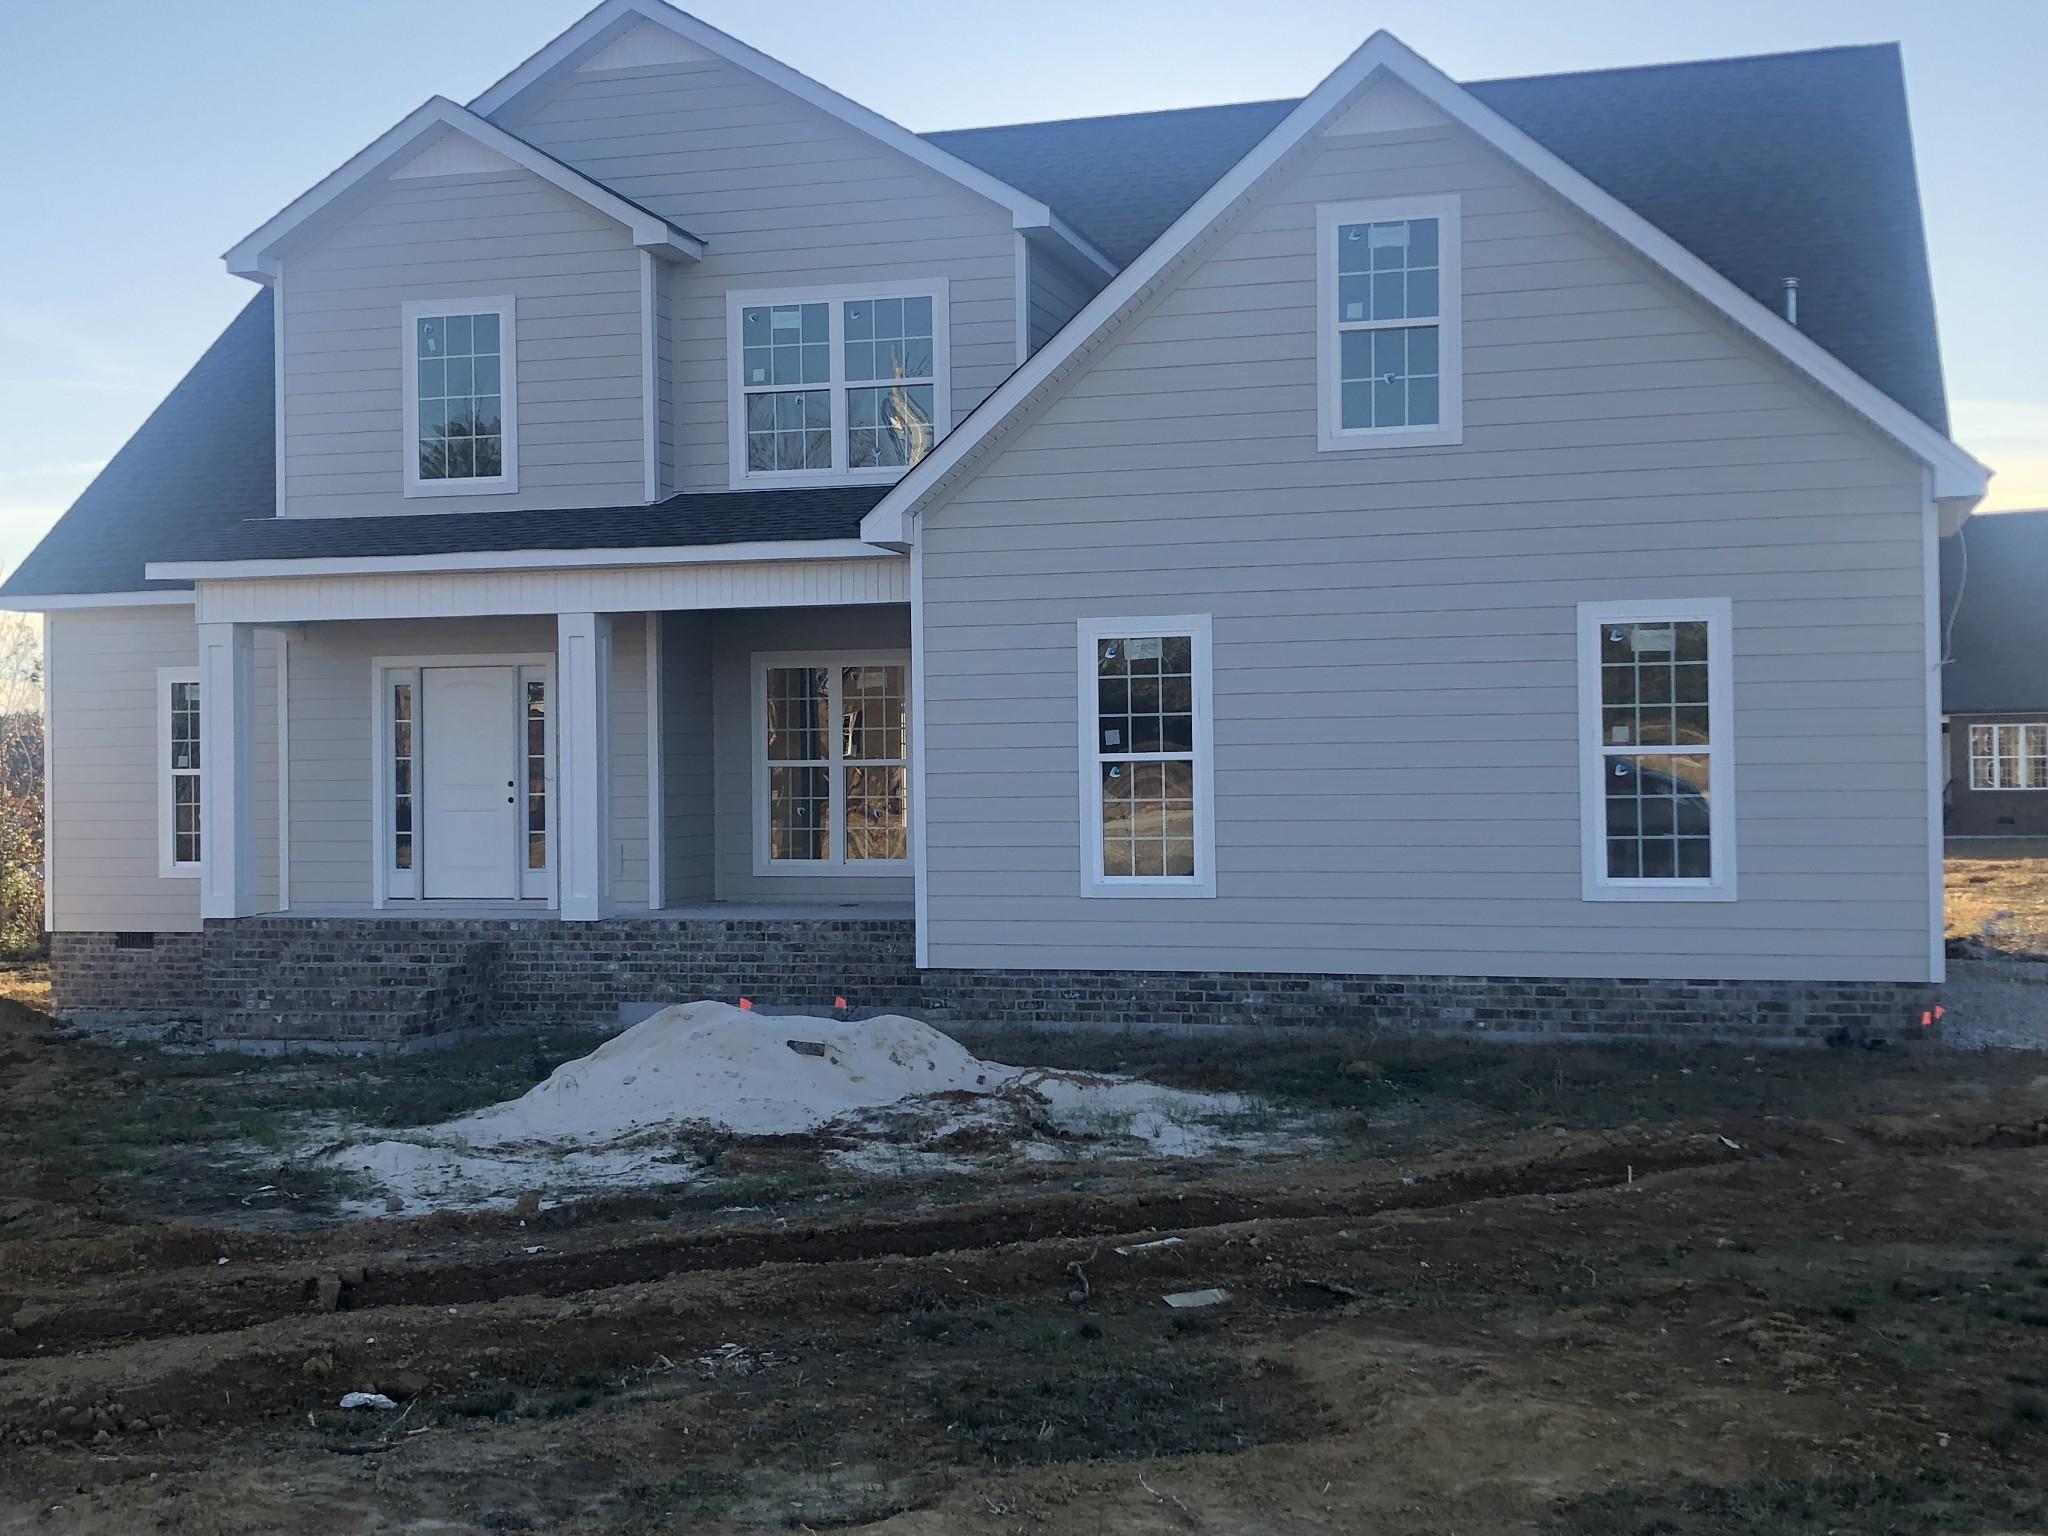 250 Aberdeen Ave, Hillsboro, TN 37342 - Hillsboro, TN real estate listing